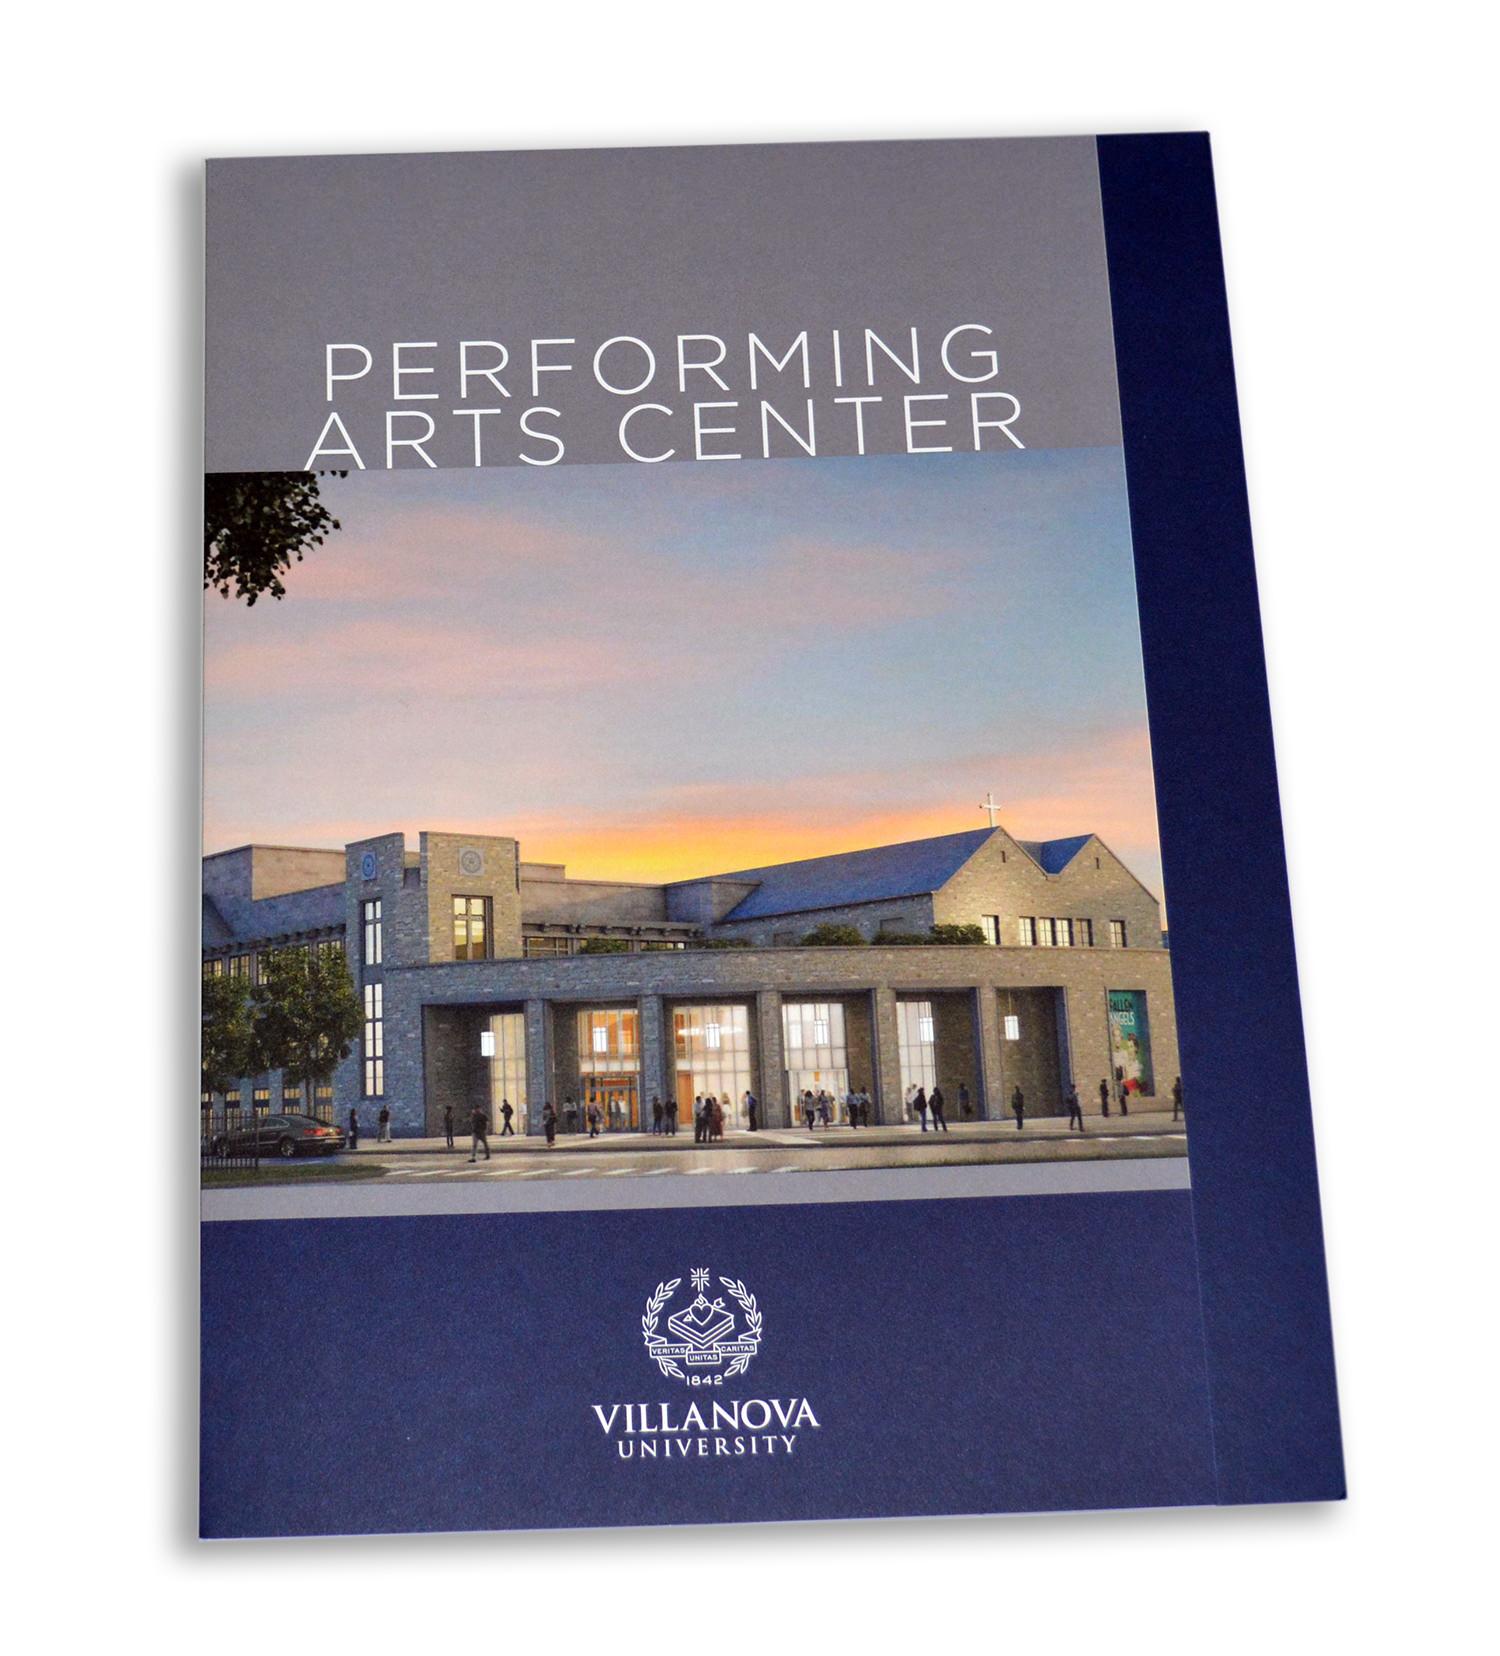 suzanne-guelli-villanova-art-center-folder.jpg